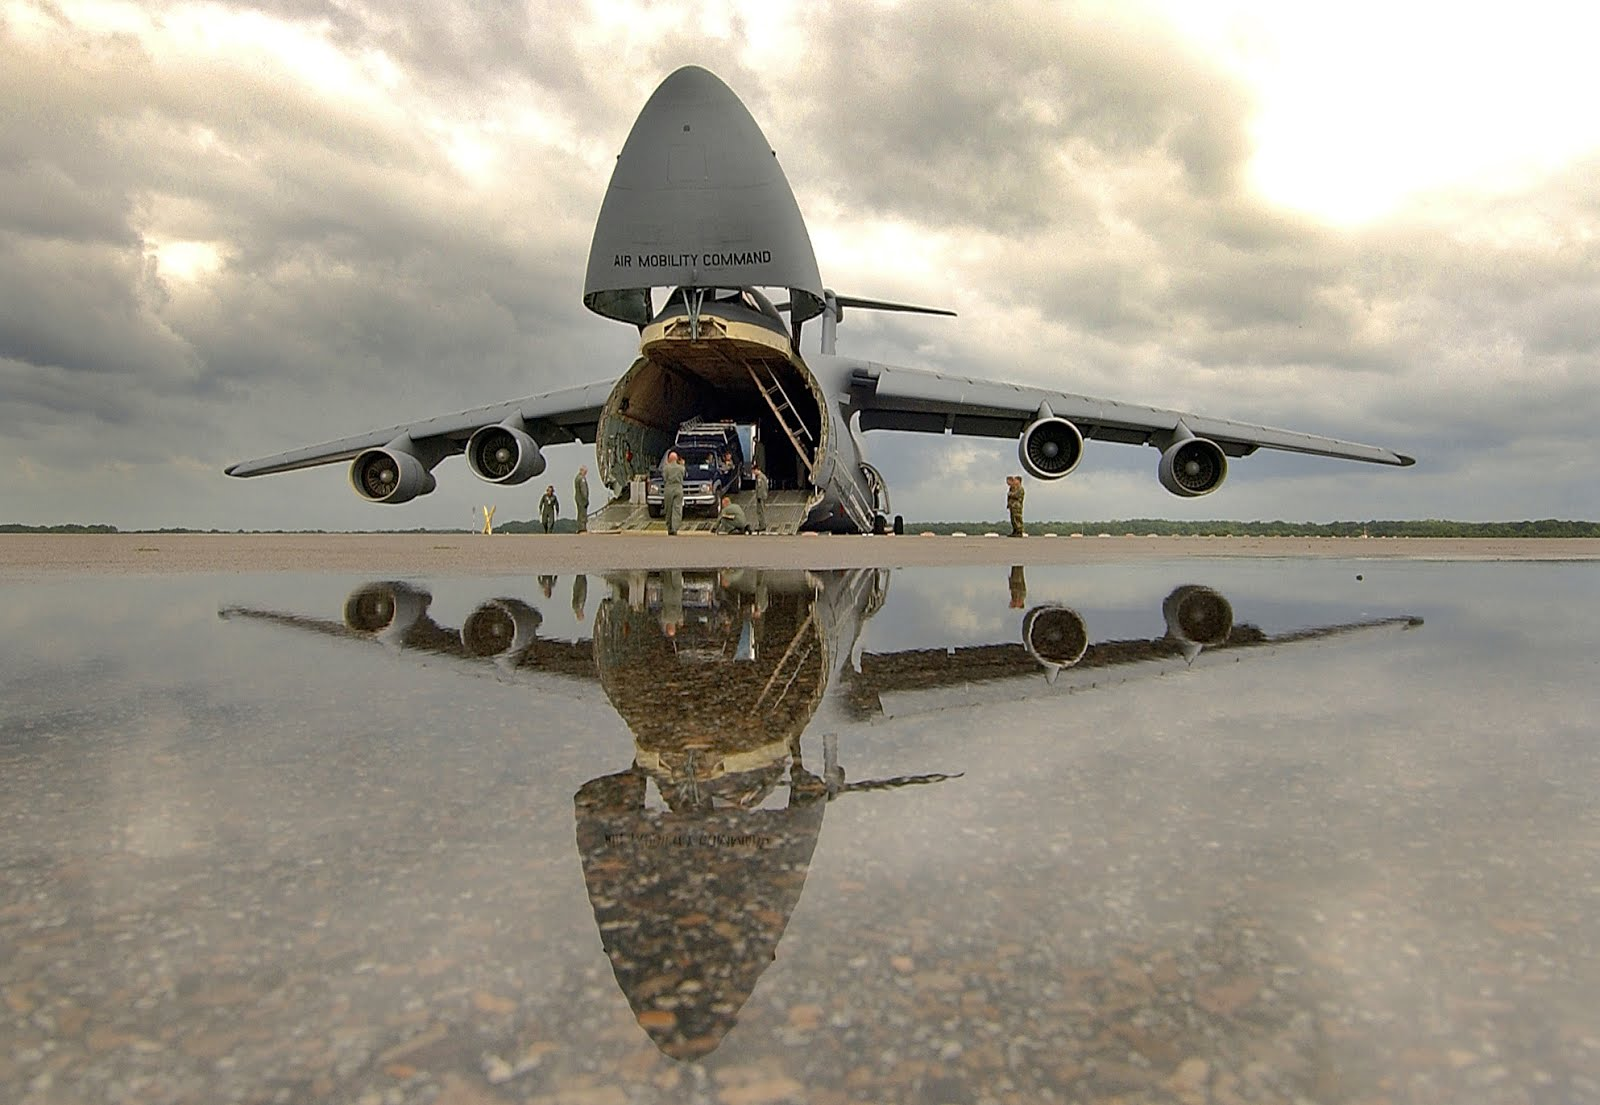 Army cargo plane clipart.